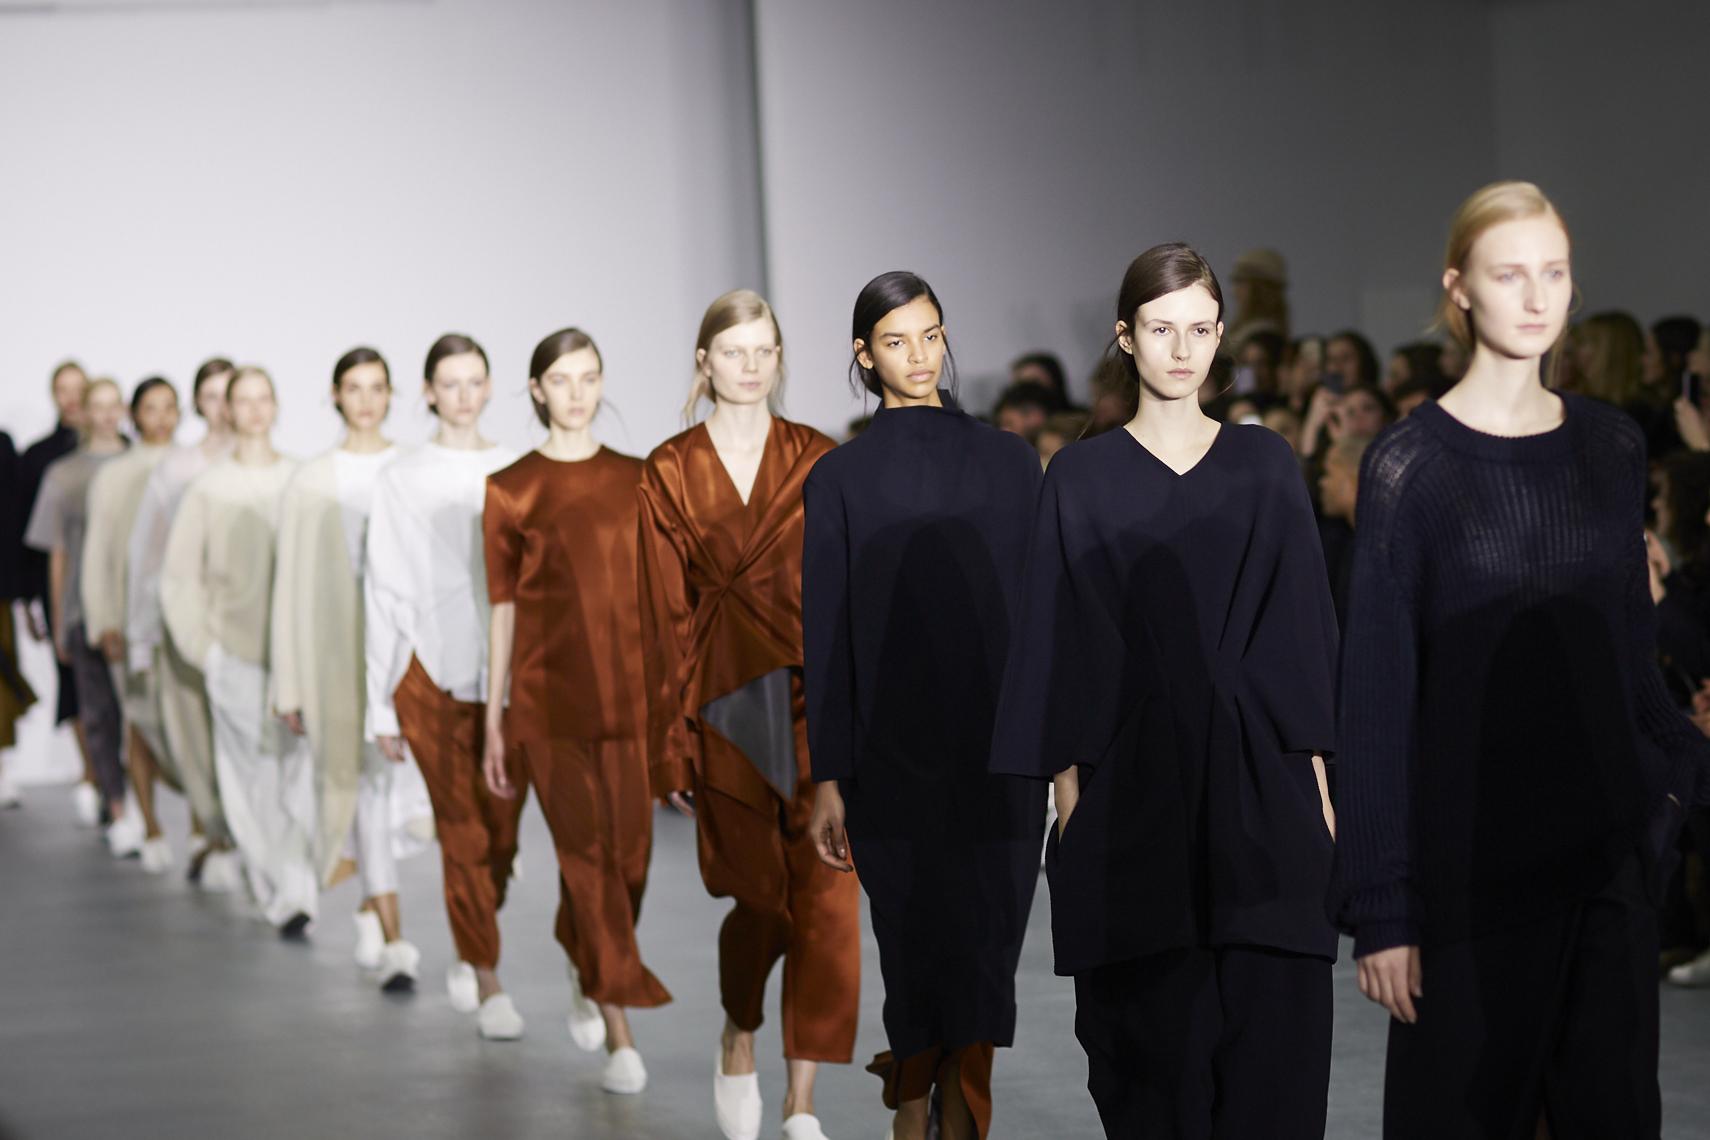 London Fashion Week AW16 / BRITISH FASHION COUNCIL / BFC / 1205 AW16